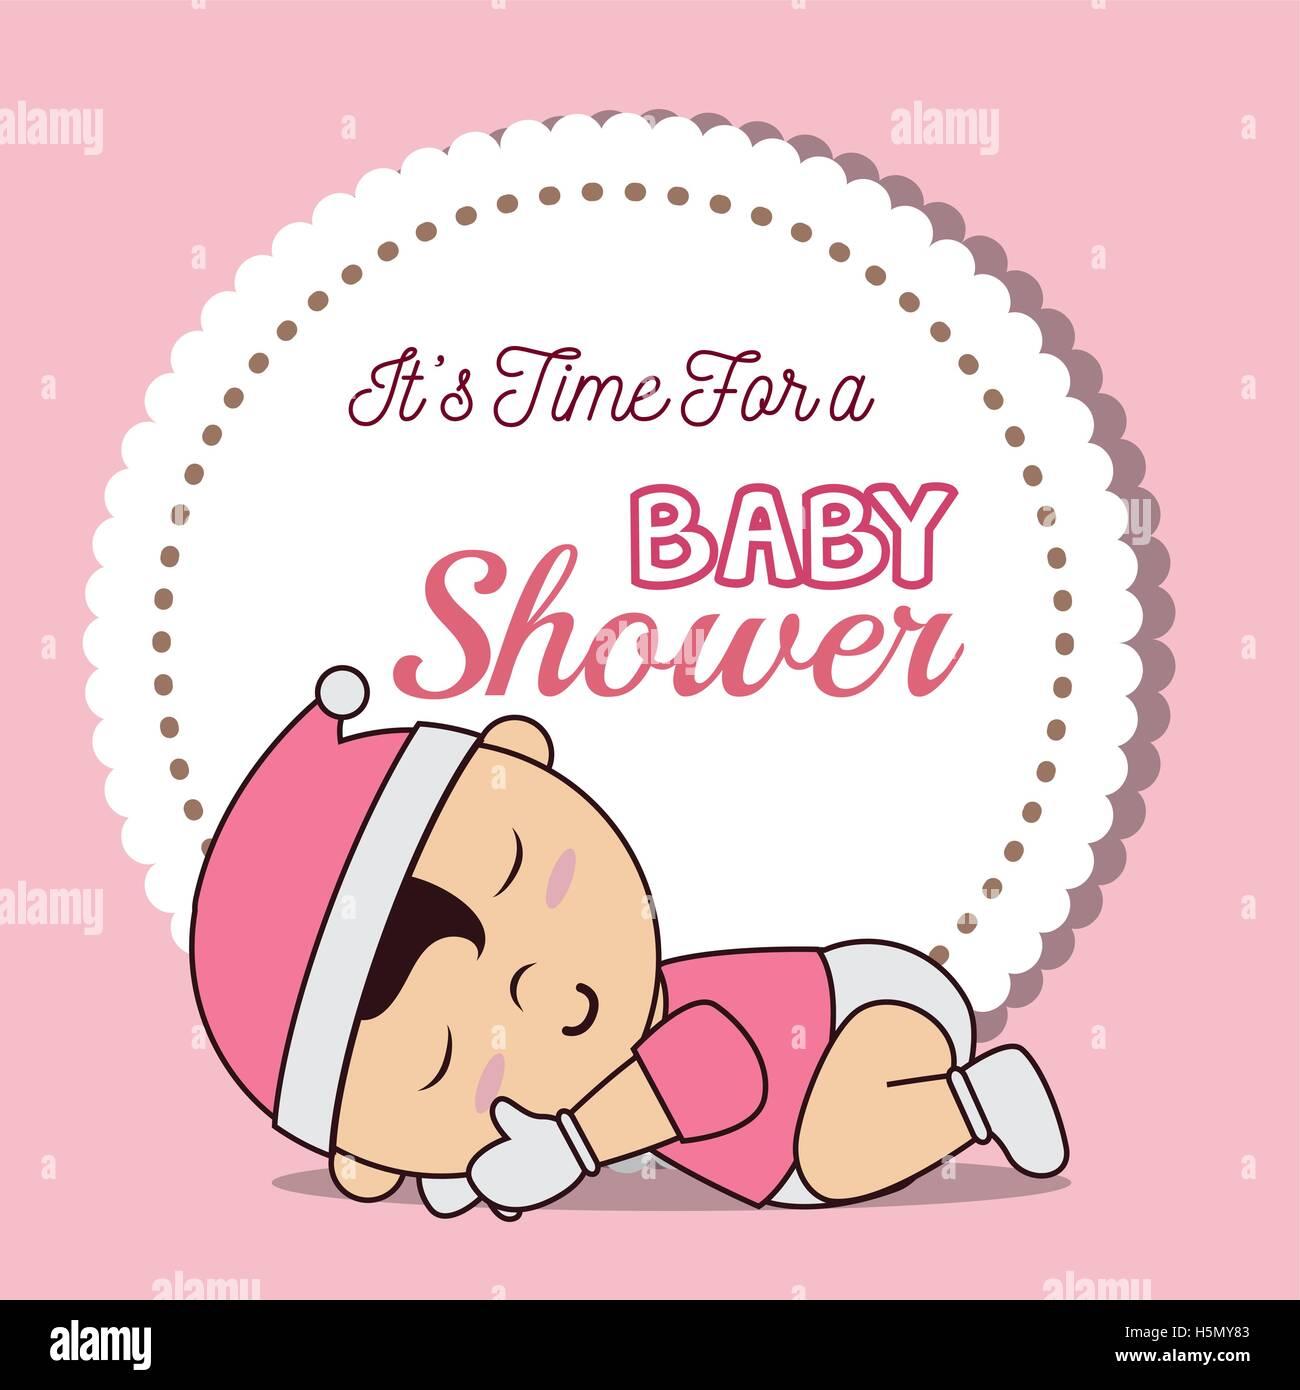 Cartoon Illustration Newborn Baby Sleeping Stock Photos & Cartoon ...